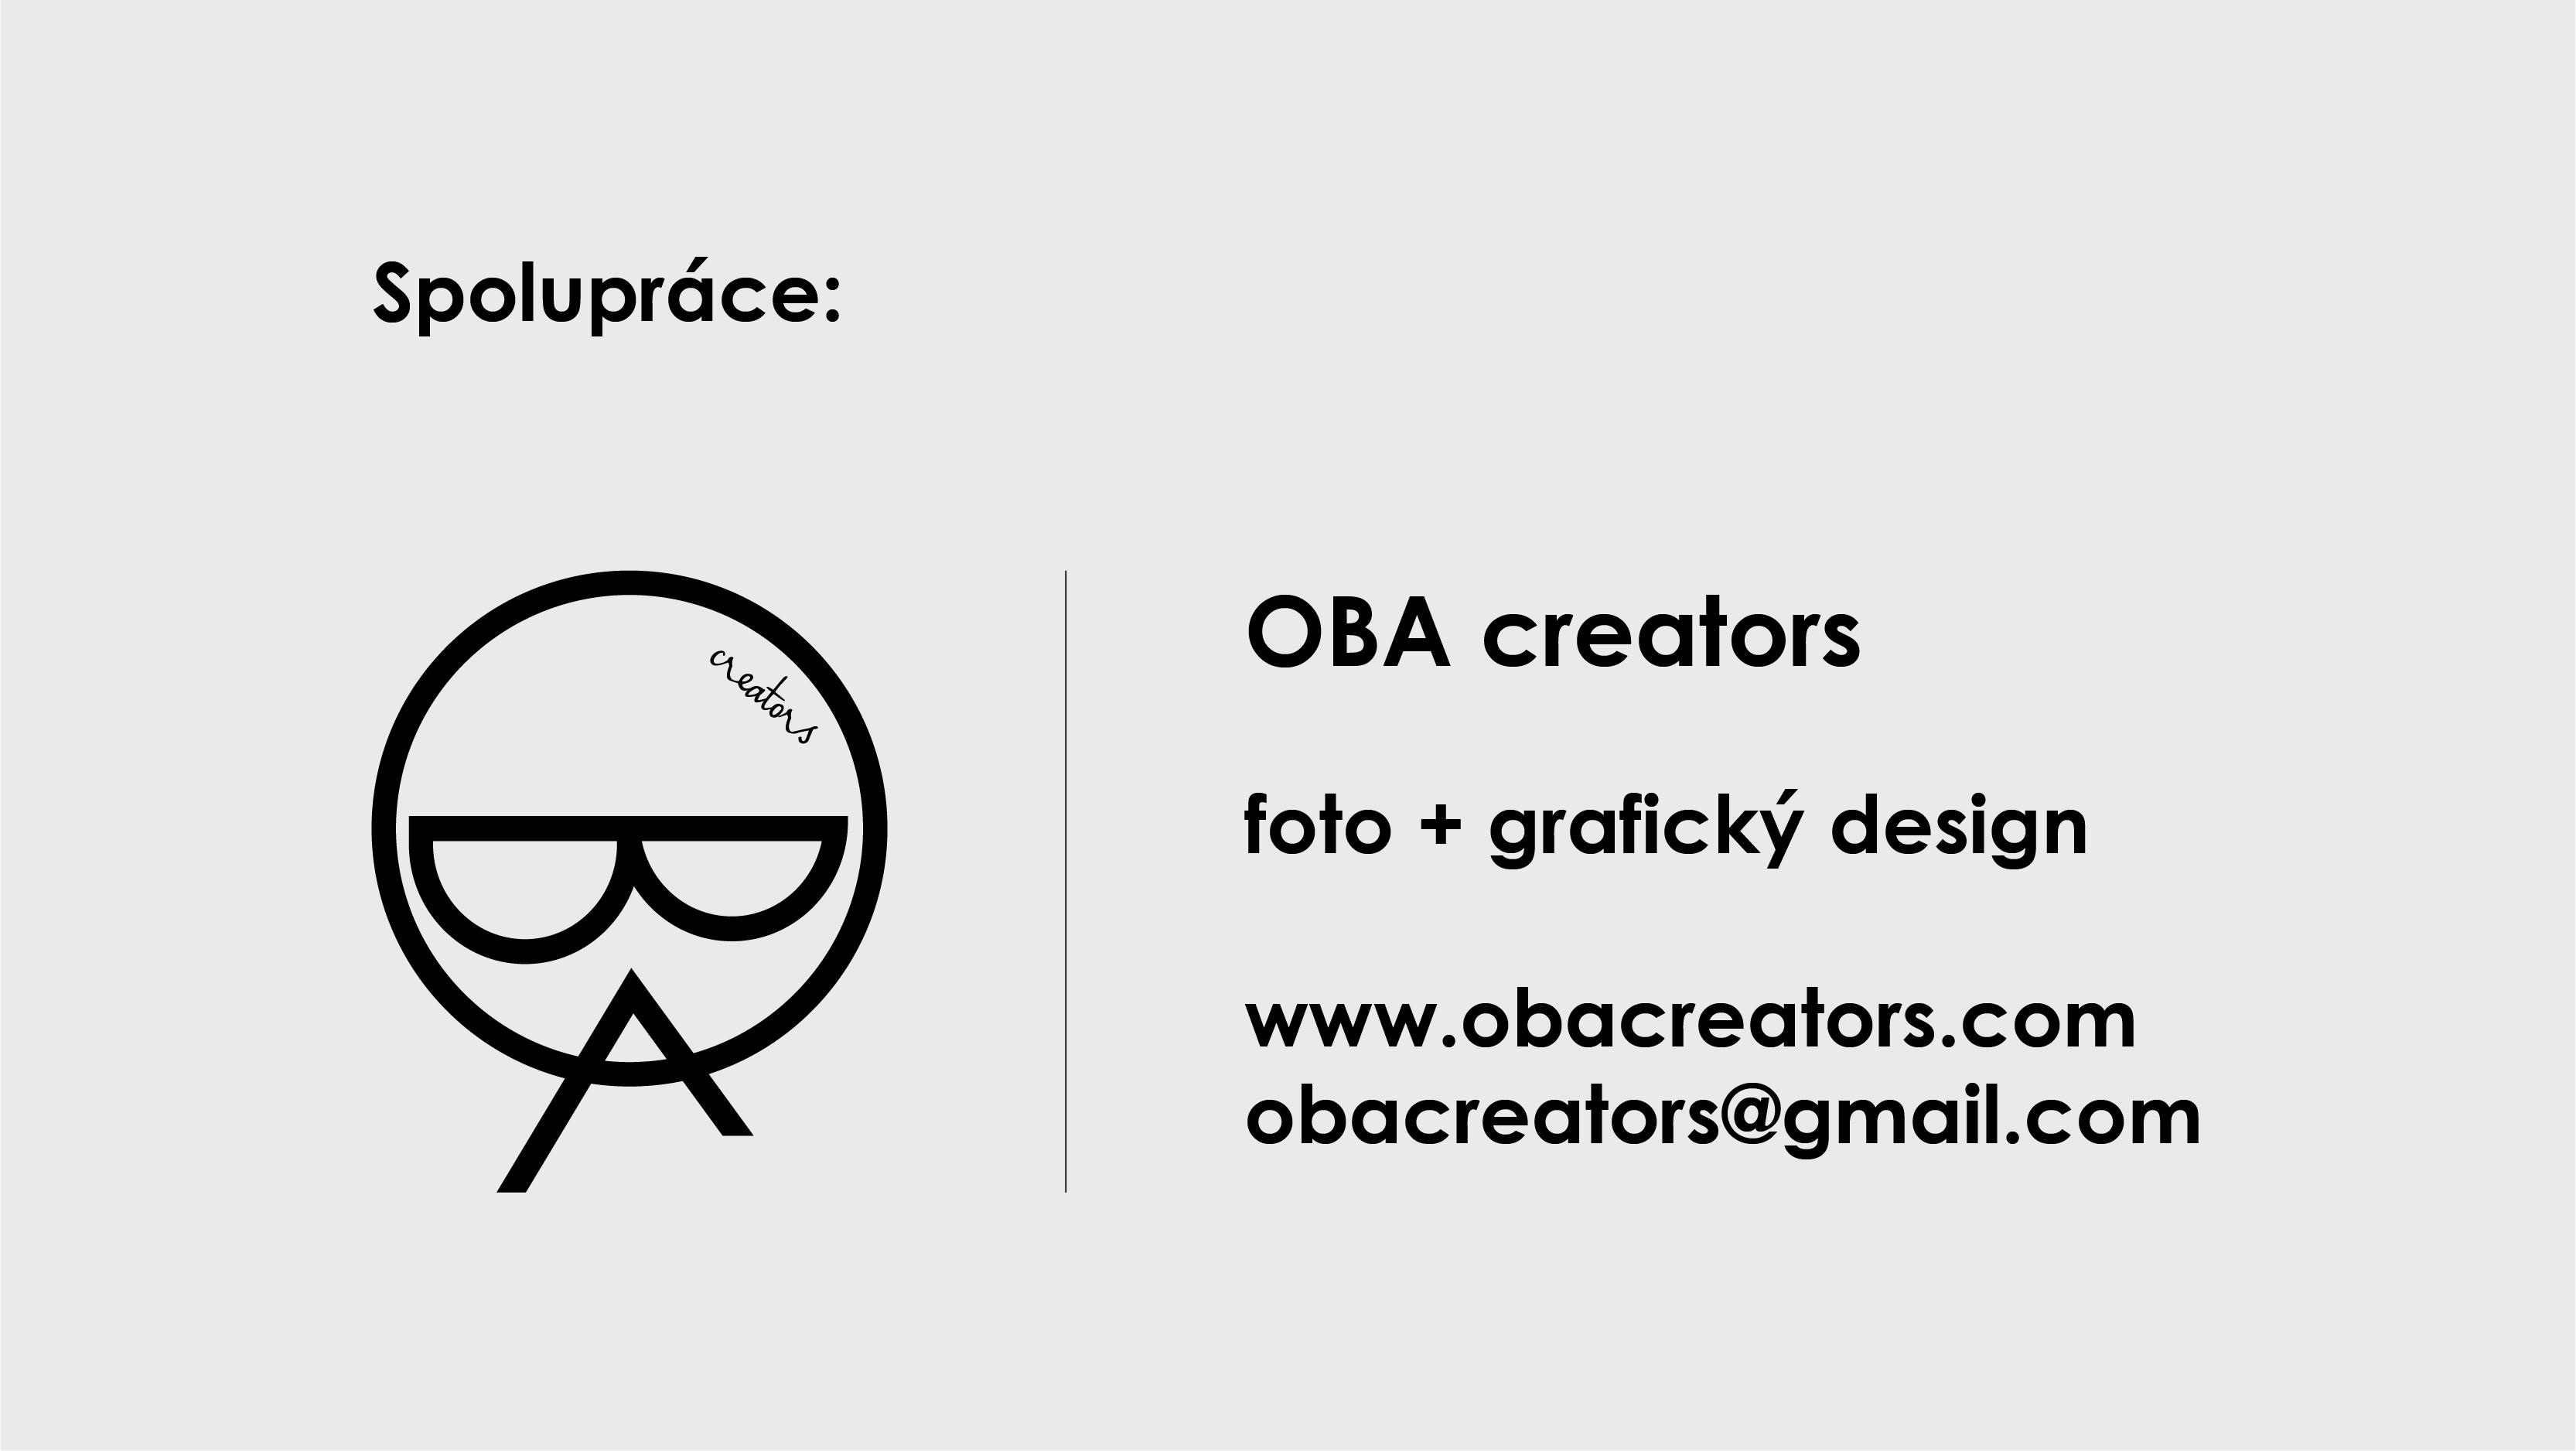 Spolupráce OBA creators